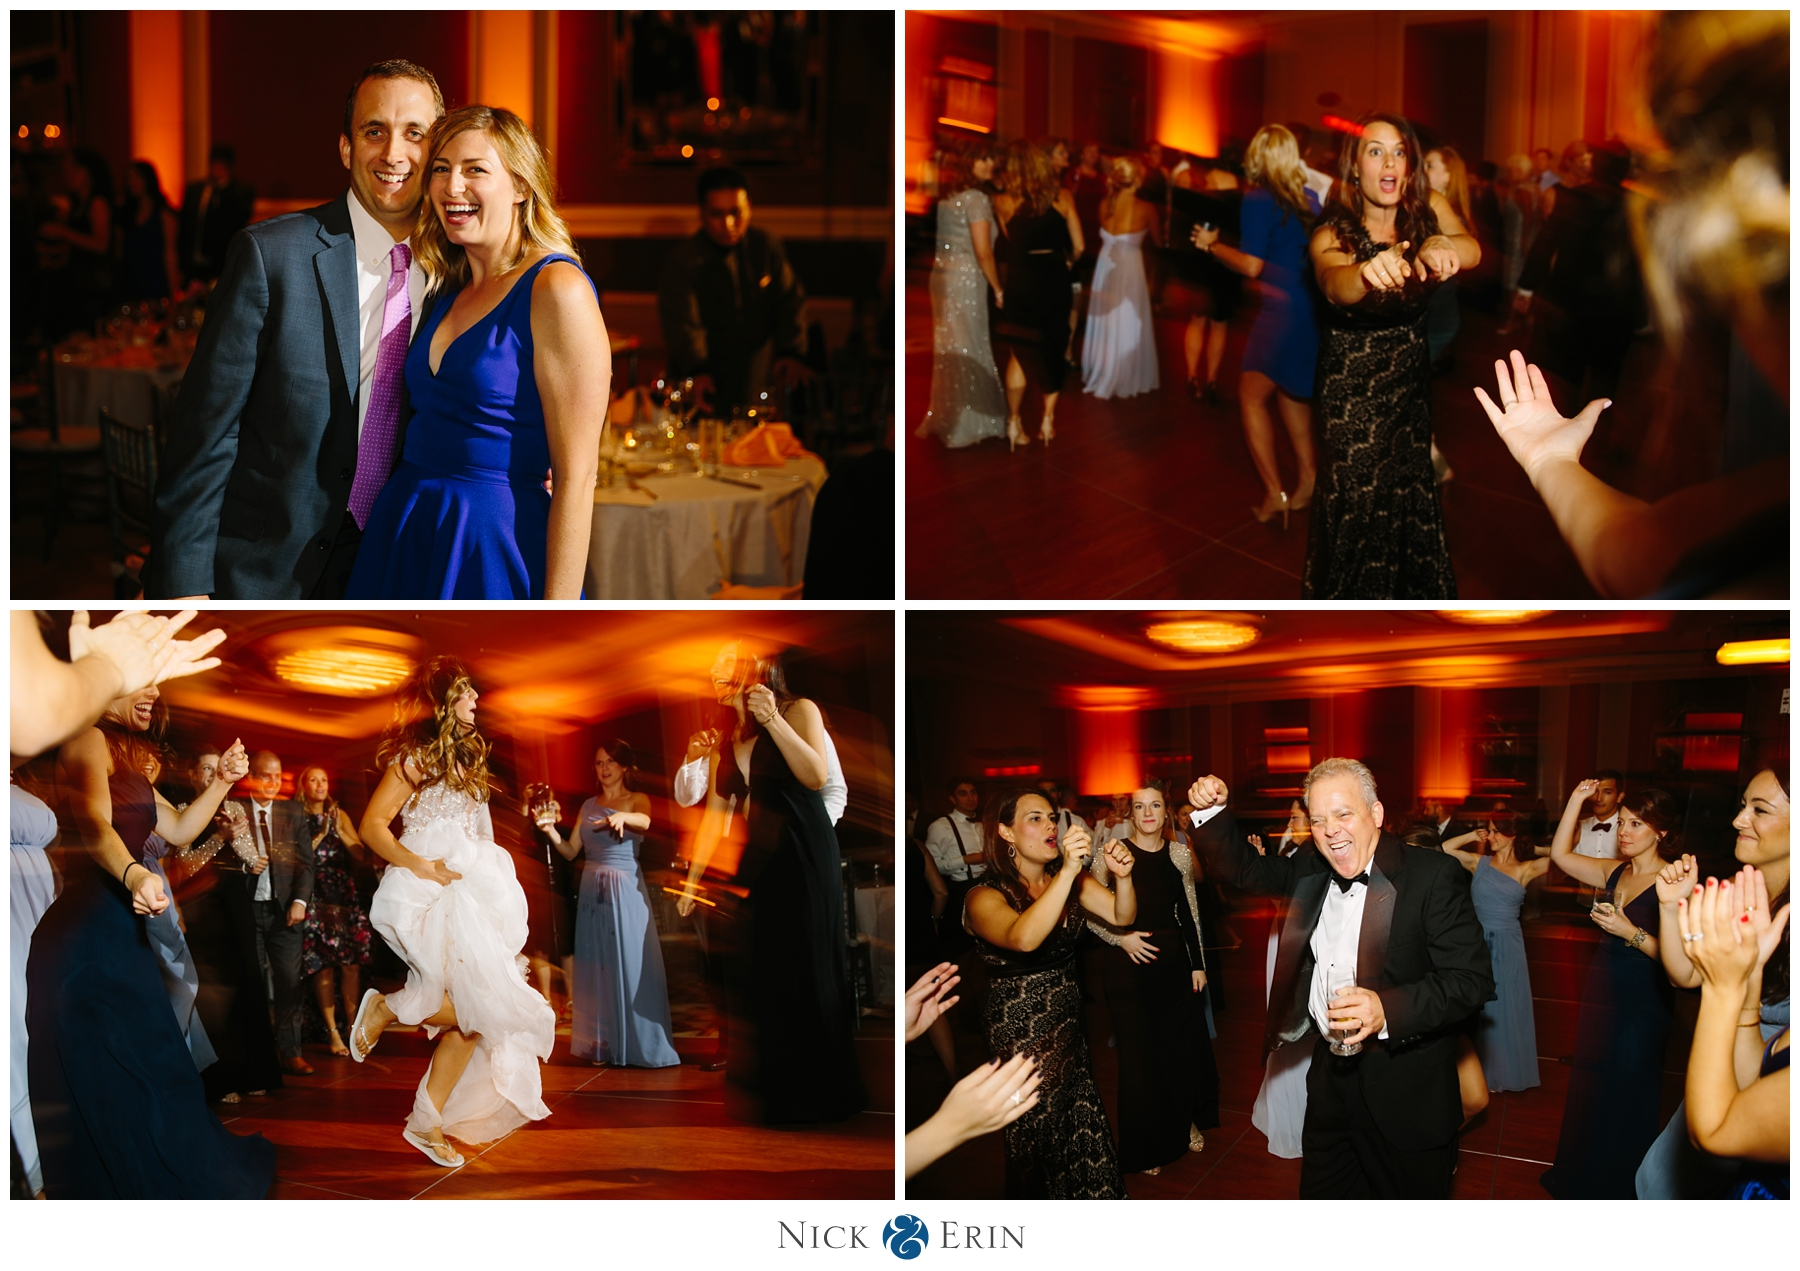 donner_photography_washington-dc-wedding_ariel-patrick_0085